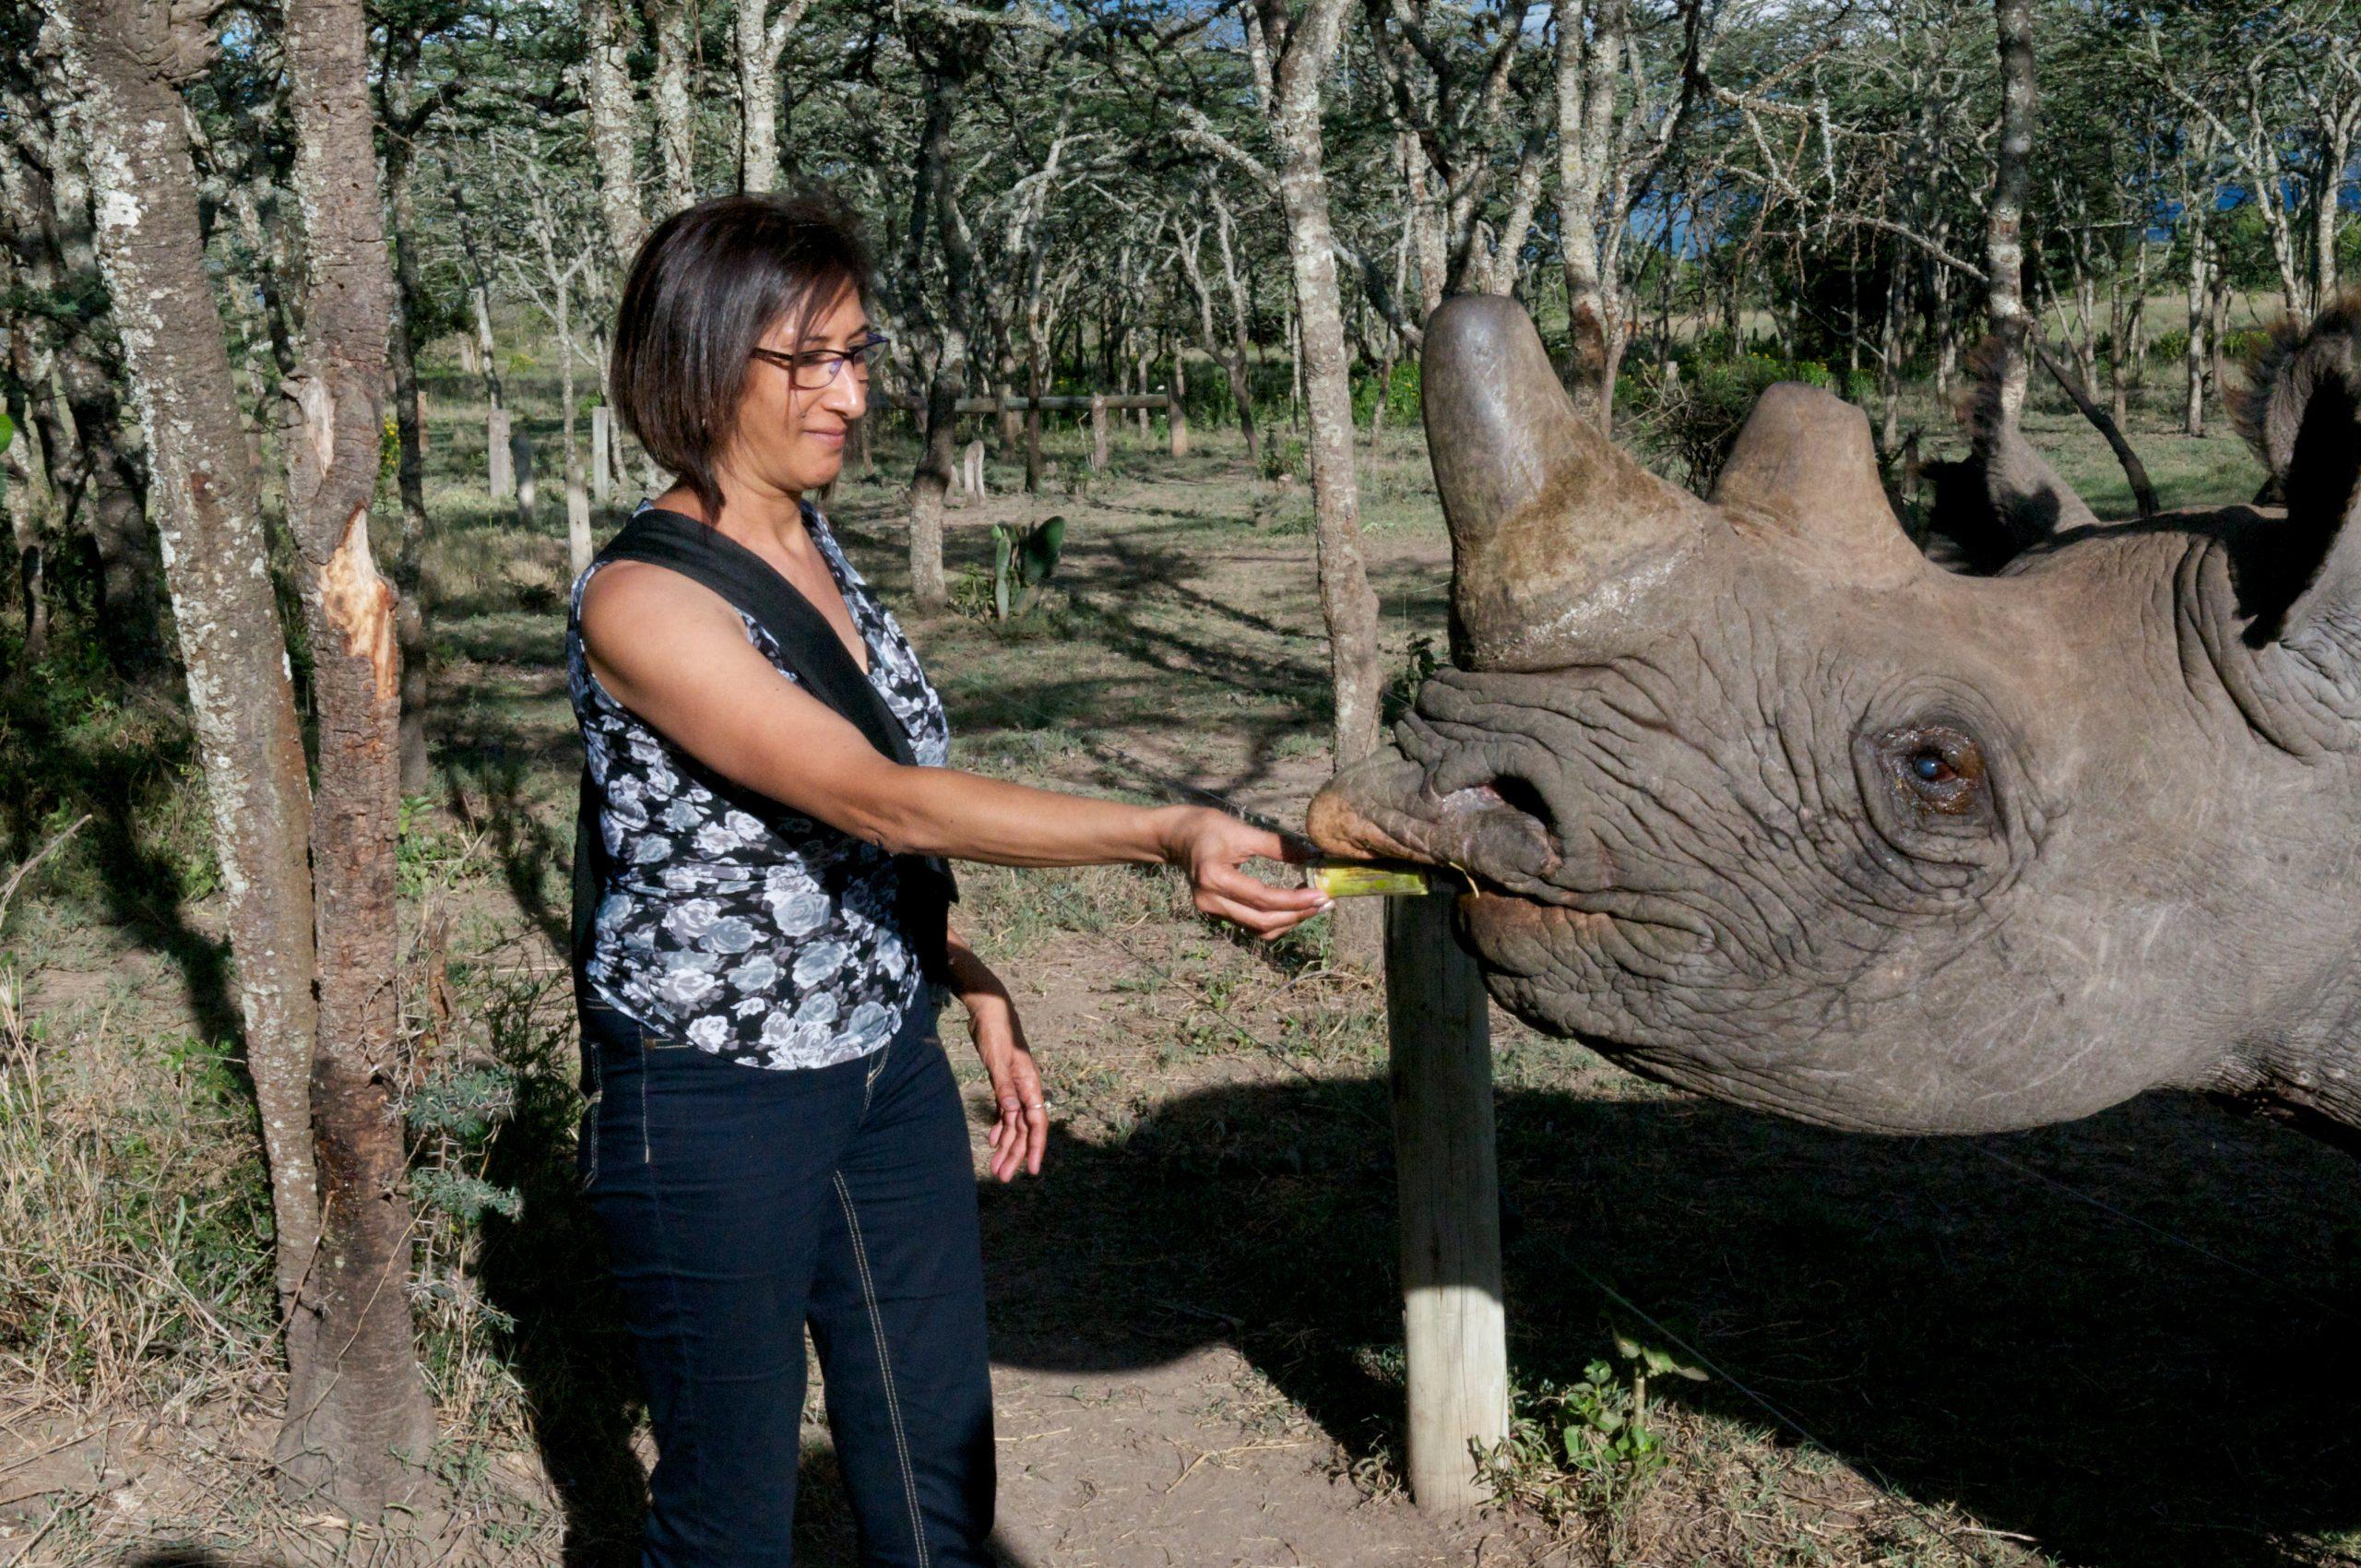 Feeding the Rhino at Ol Pejeta